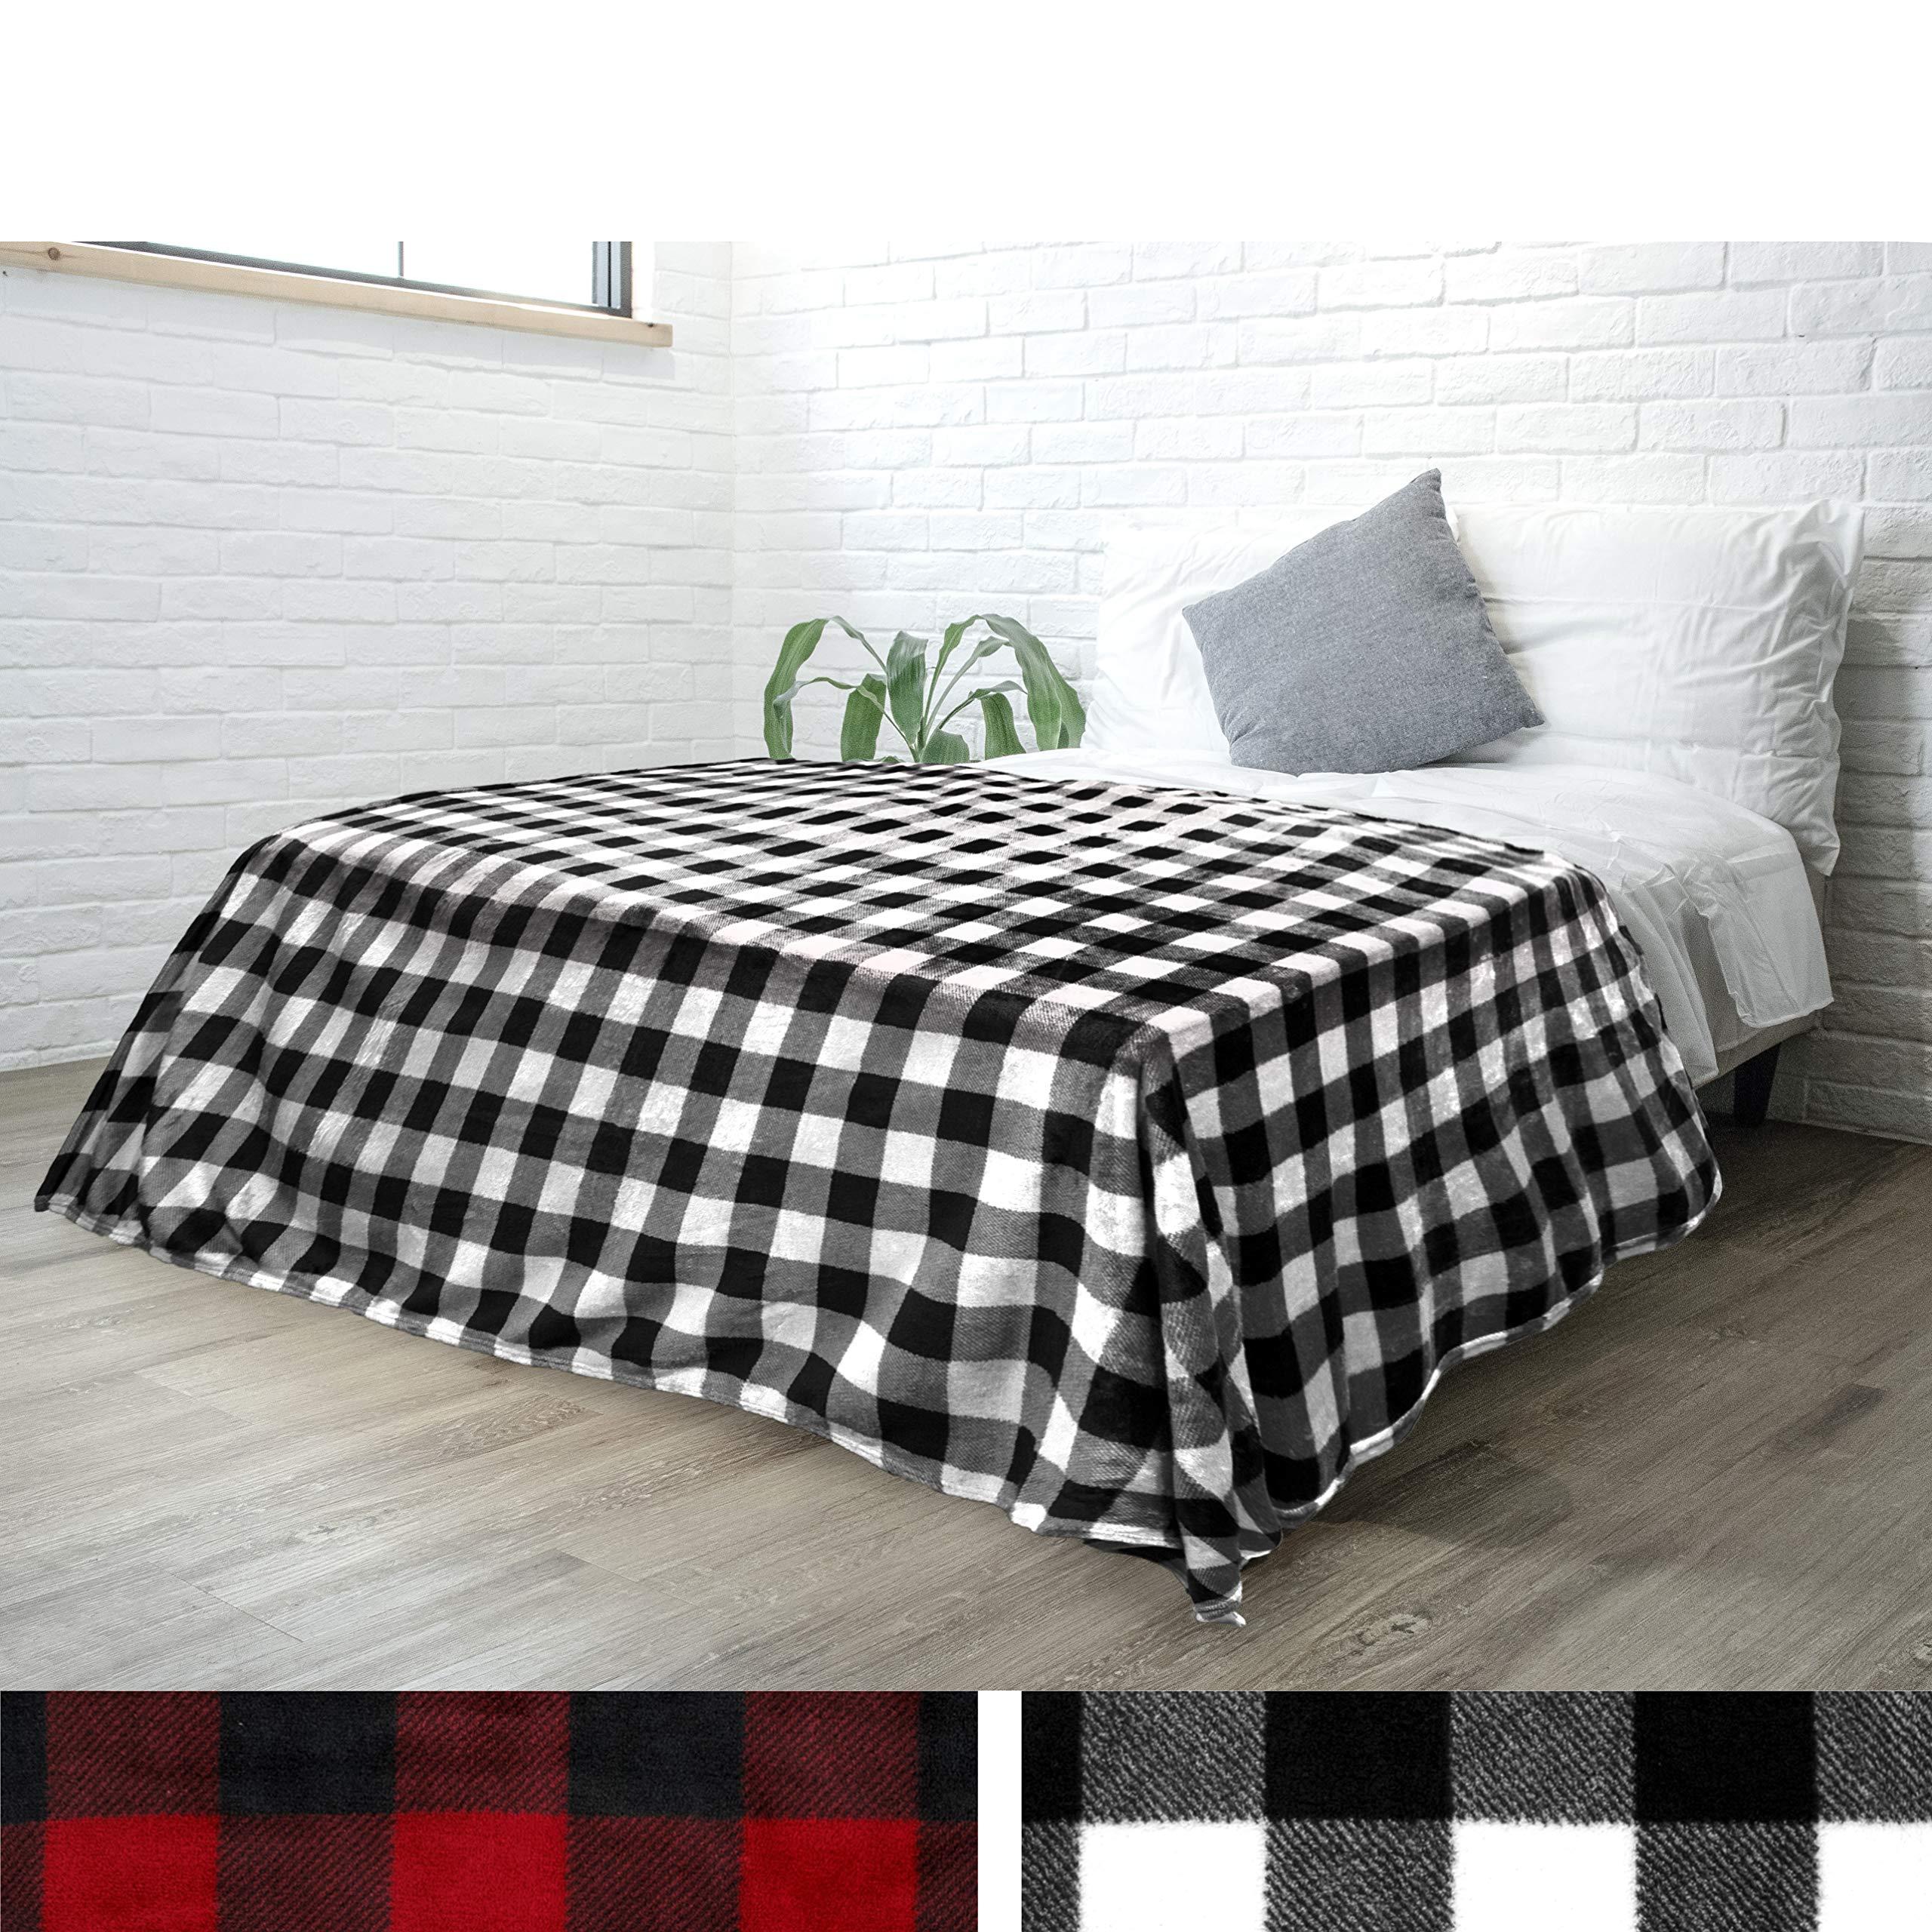 PAVILIA Flannel Fleece Buffalo Checker Blanket for Queen Bed   Super Soft Velvet Plaid Pattern Checkered Decorative Throw   Warm Cozy Lightweight Microfiber   90 x 90 Inches Plaid White/Black